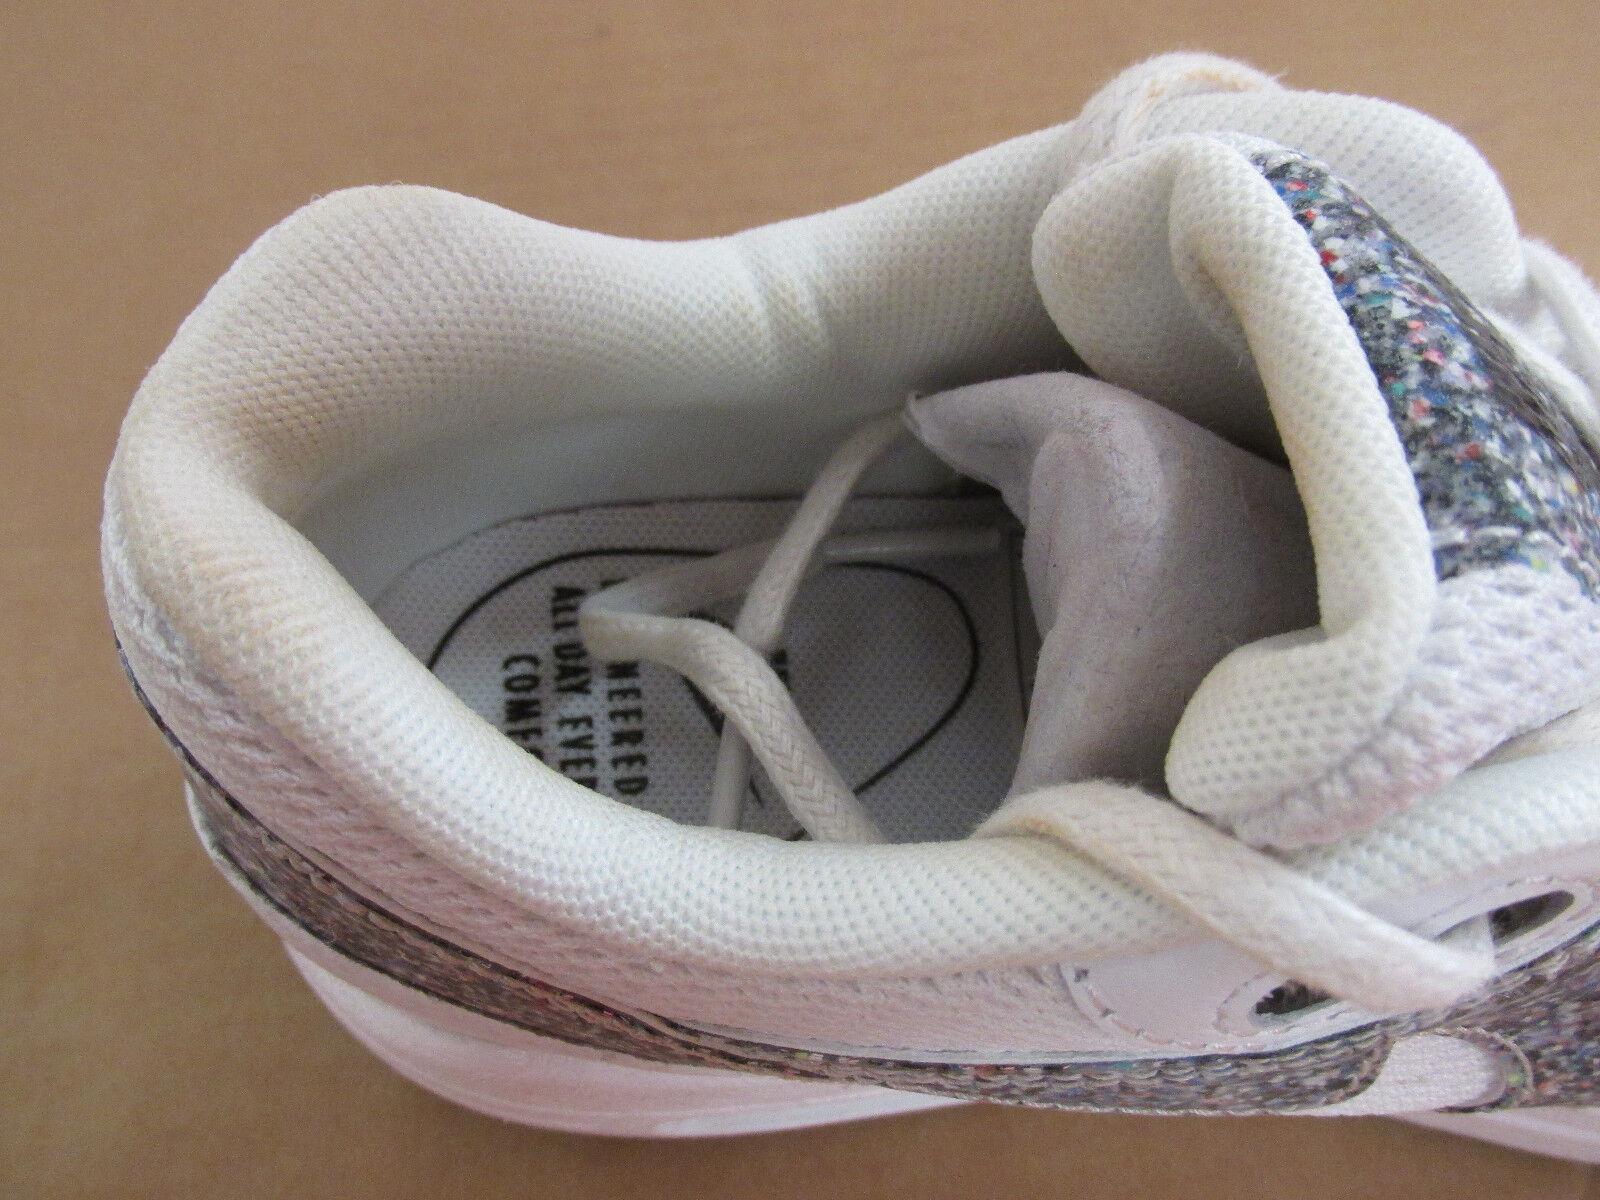 lowest price a6b66 b4ffe ... Nike mujer aire aire aire 1 m á ximo se zapatillas correndo 881101 100  zapatos liquidaci